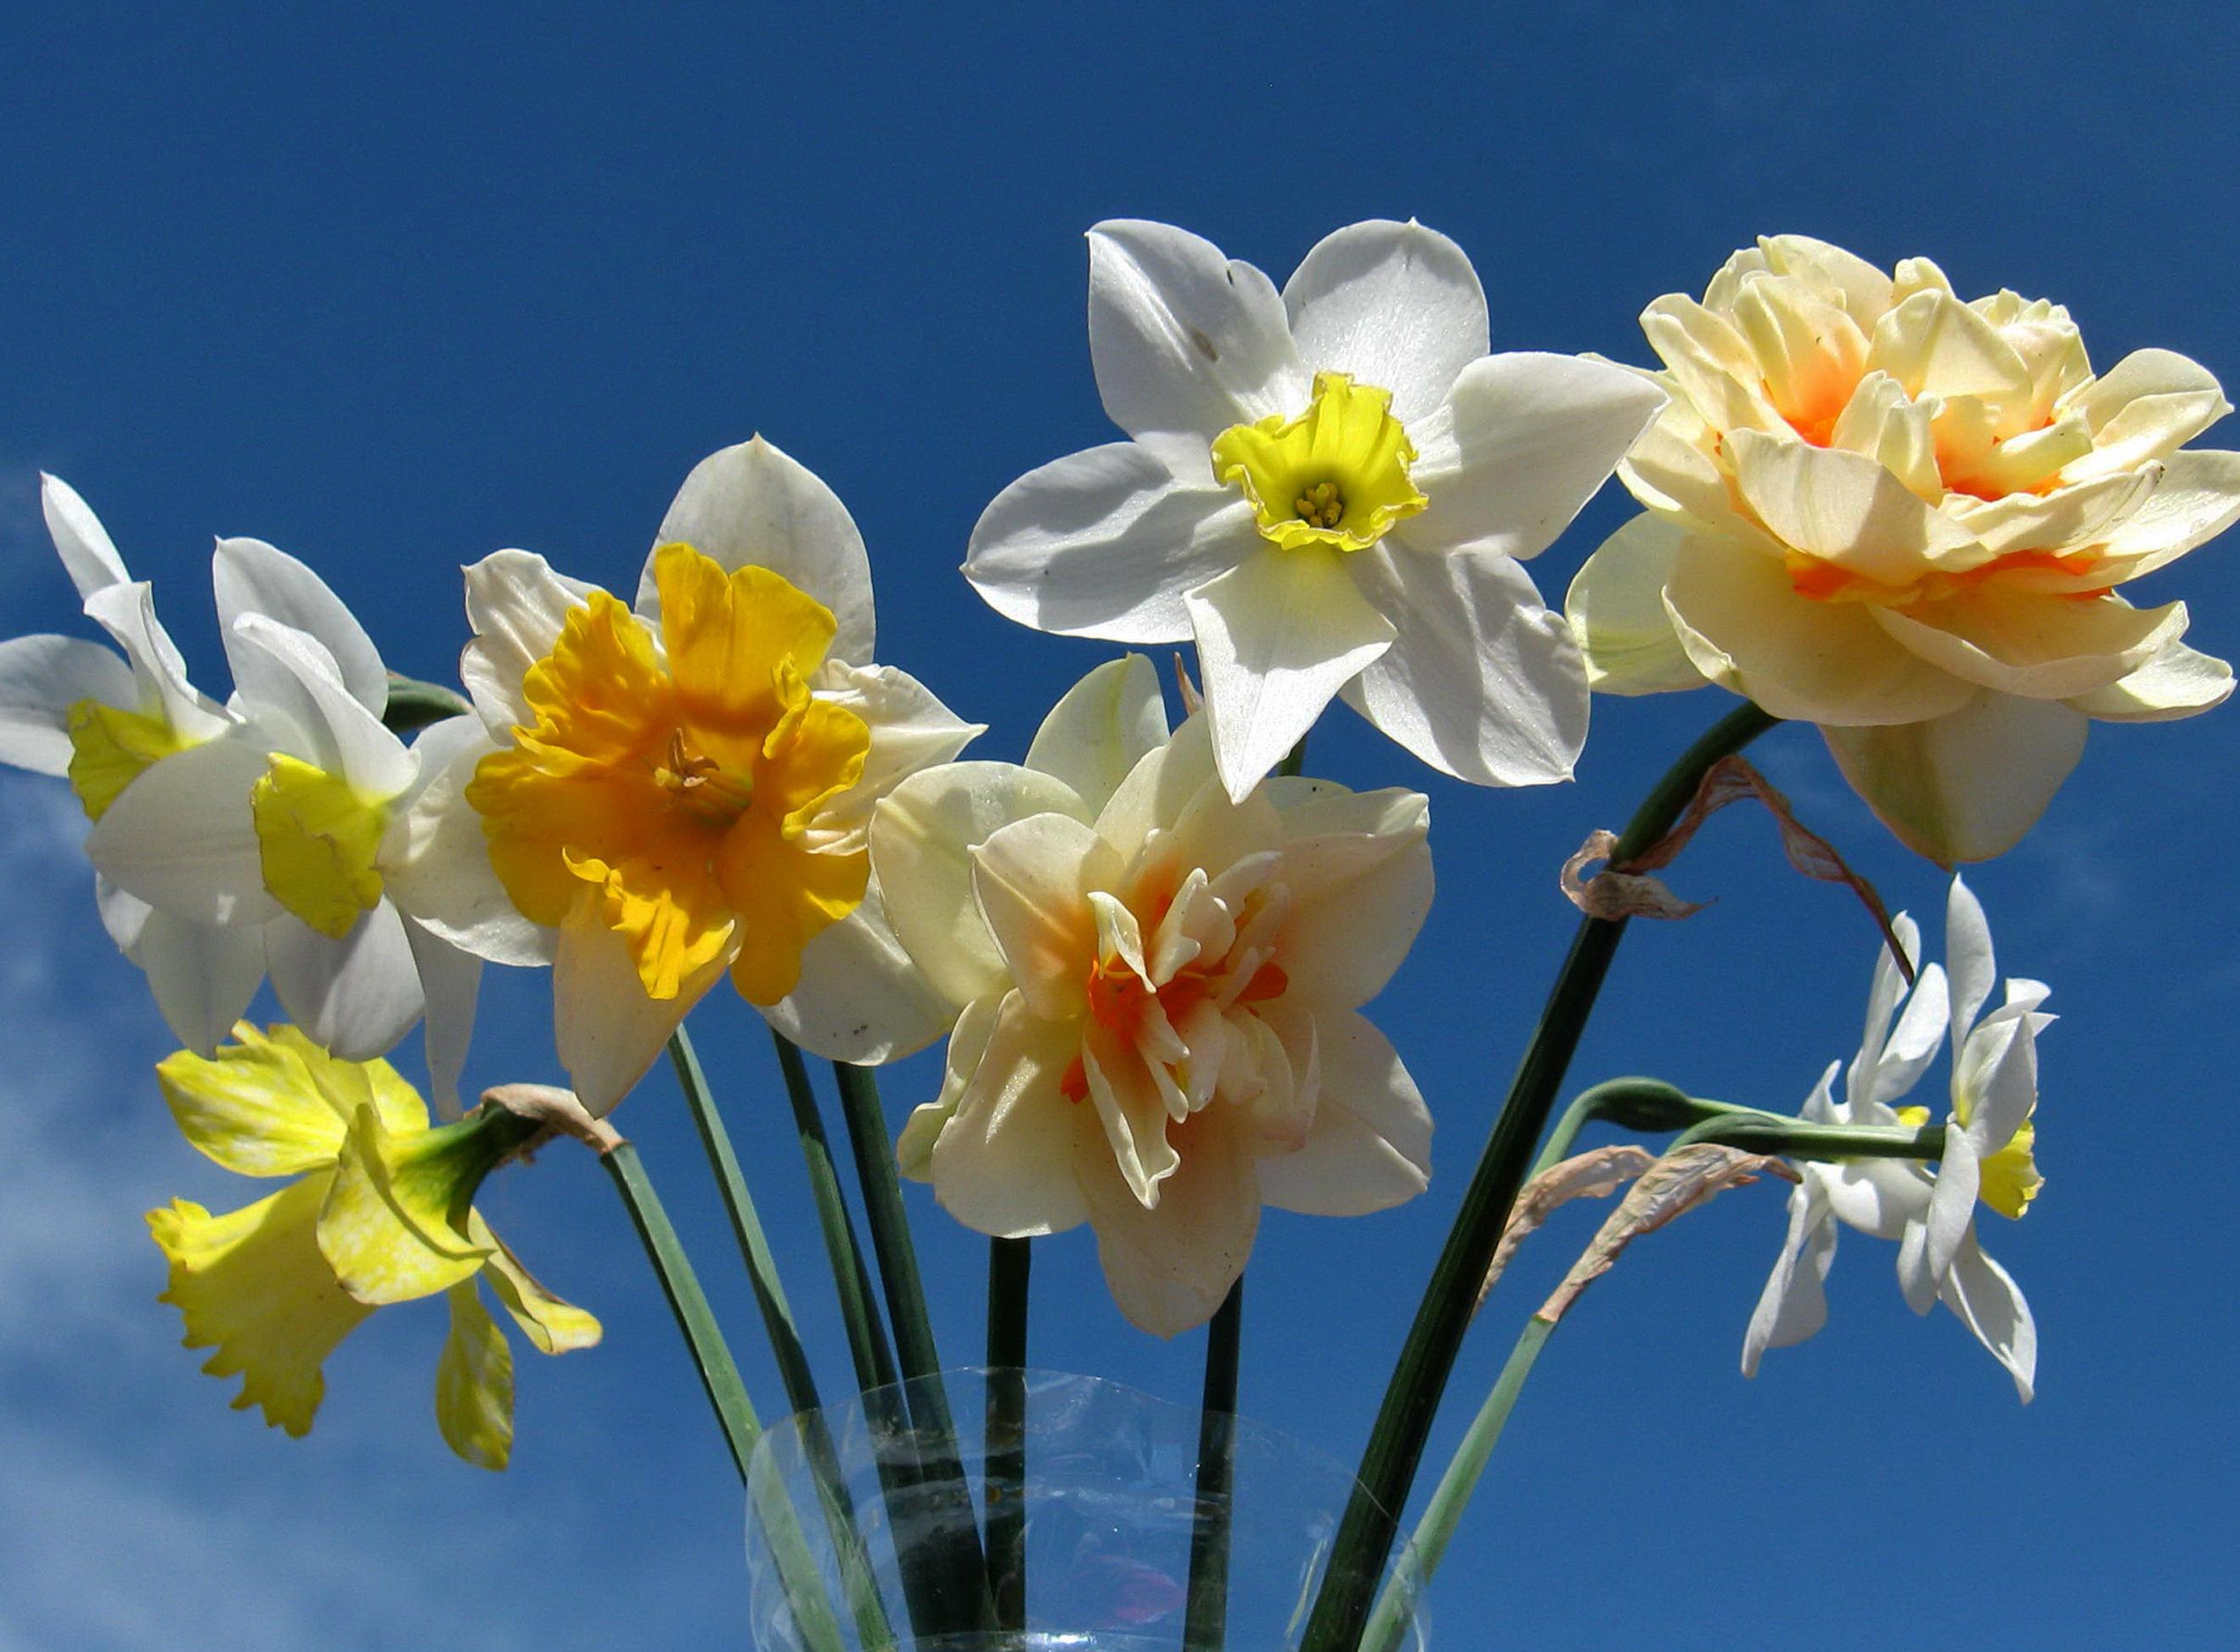 daffodils-photo-5